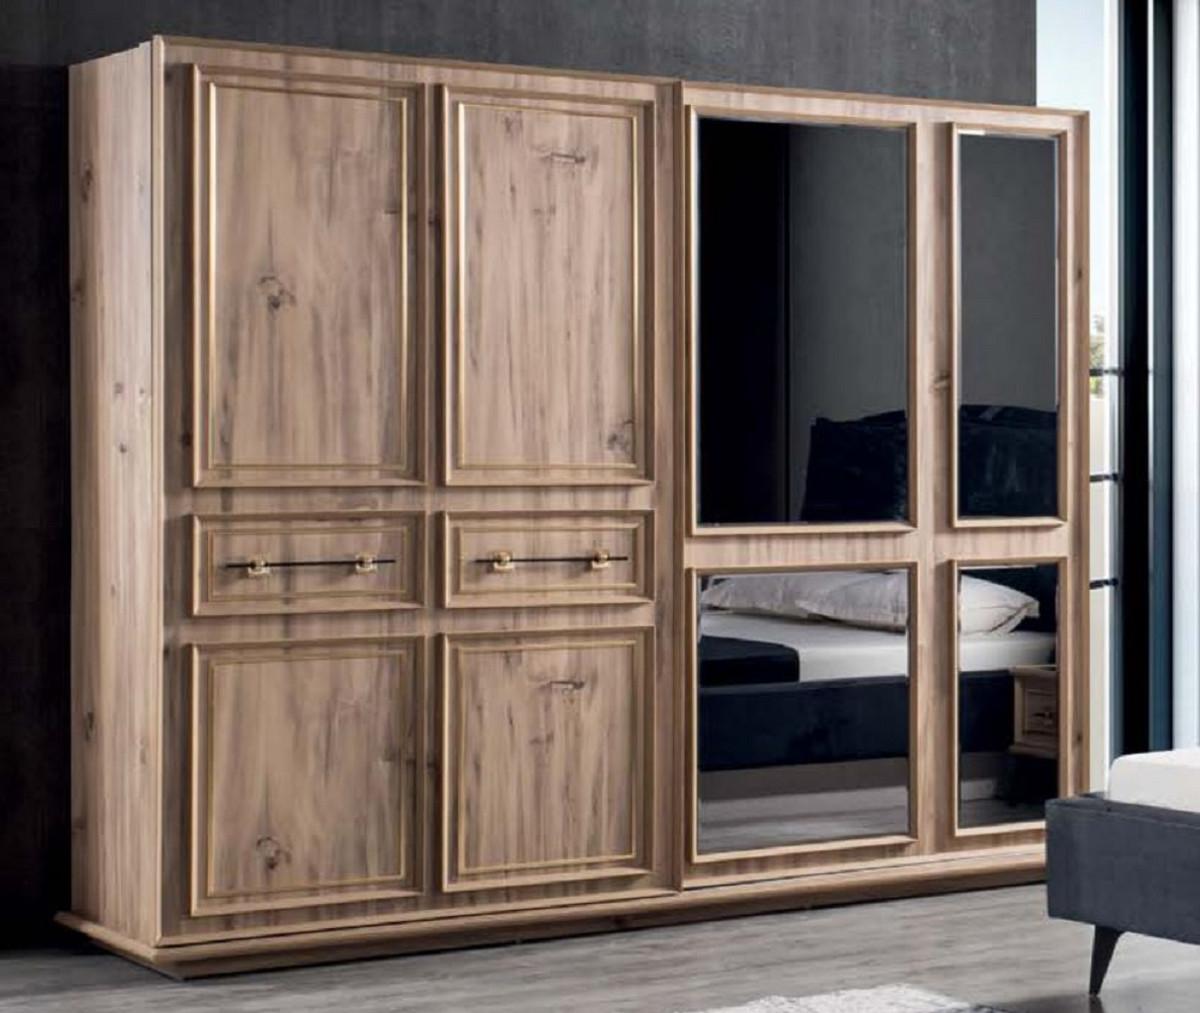 Casa Padrino Luxury Bedroom Cabinet Brown 262 X 72 X H 216 Cm Modern Solid Wood Wardrobe With 2 Sliding Doors Luxury Bedroom Furniture